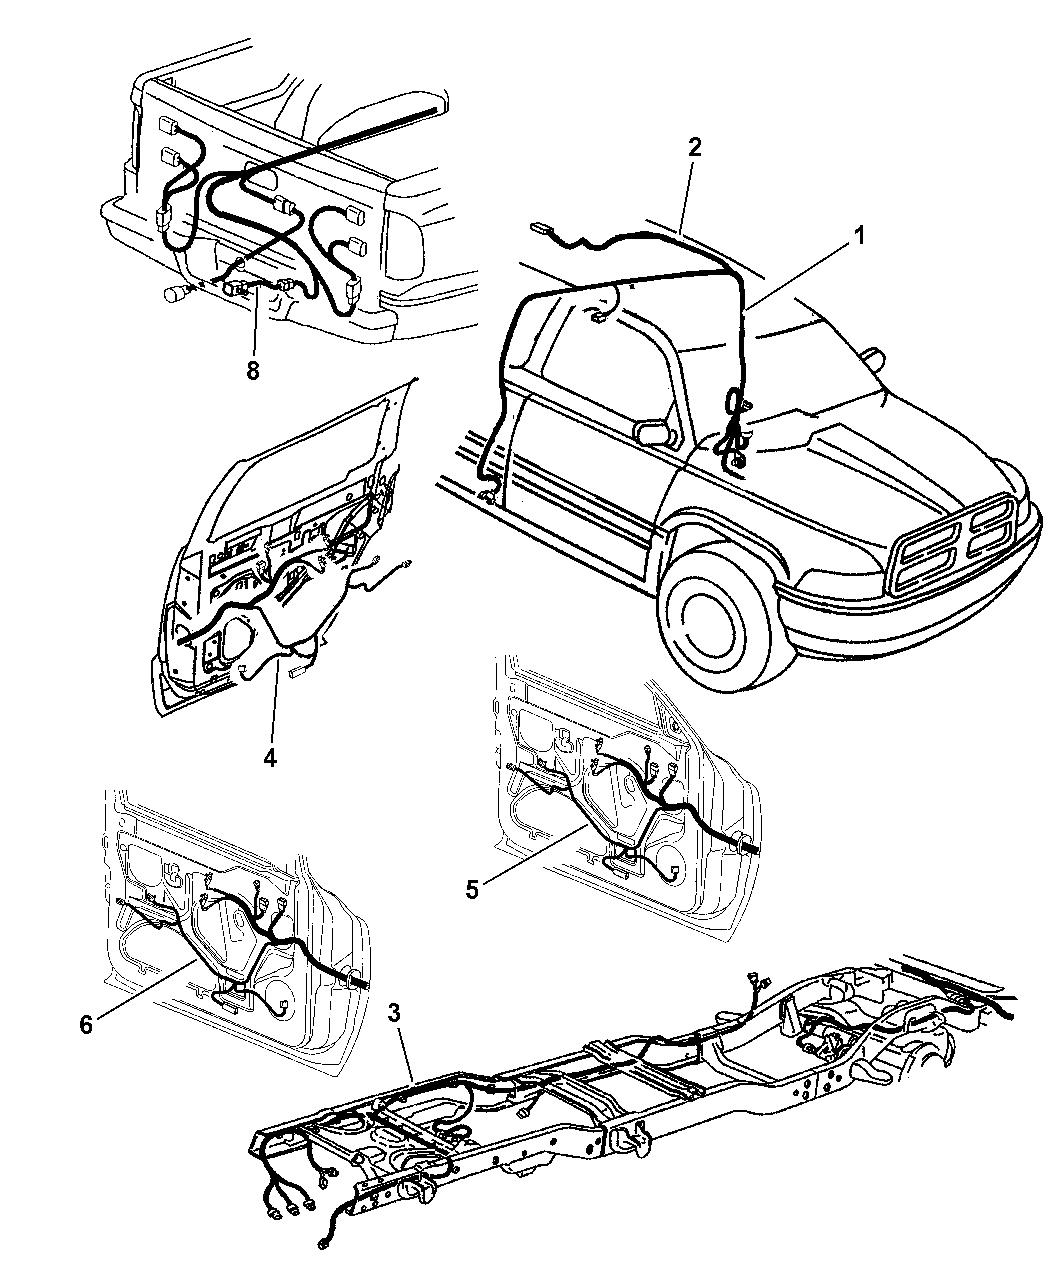 1997 Dodge Ram 2500 Wiring